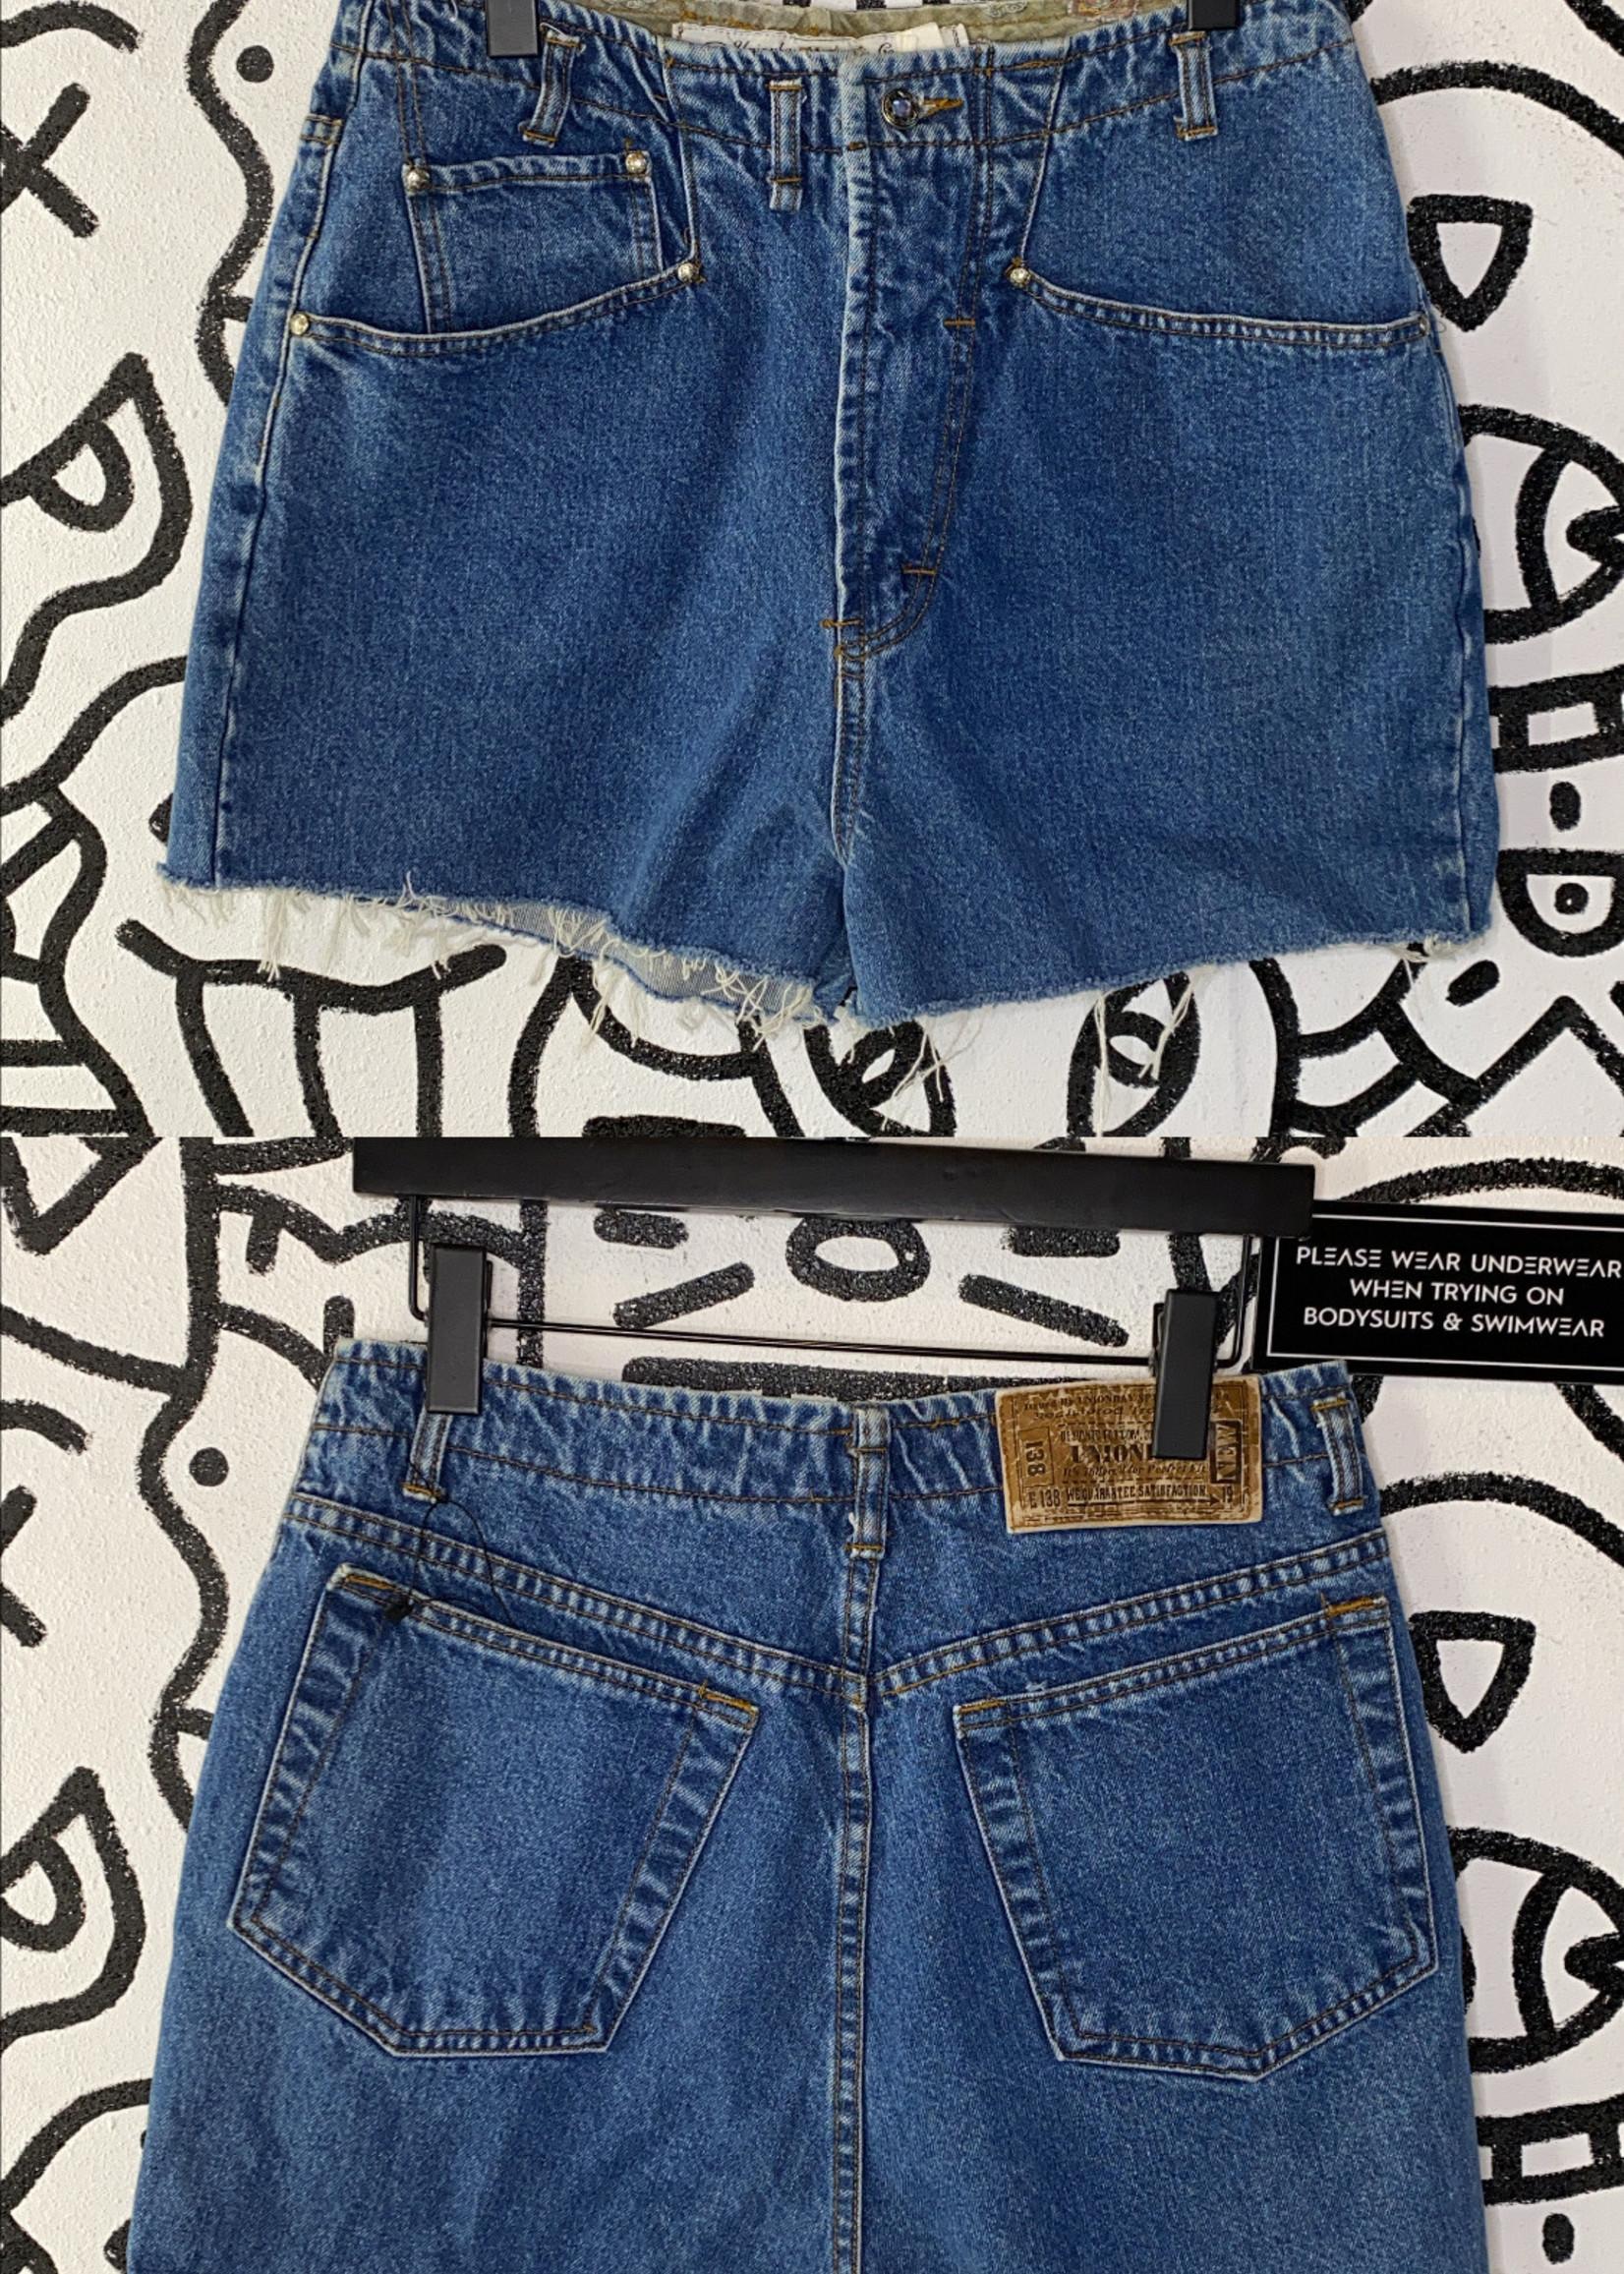 "Union bay denim and co Vintage cut off denim jean shorts 30"""